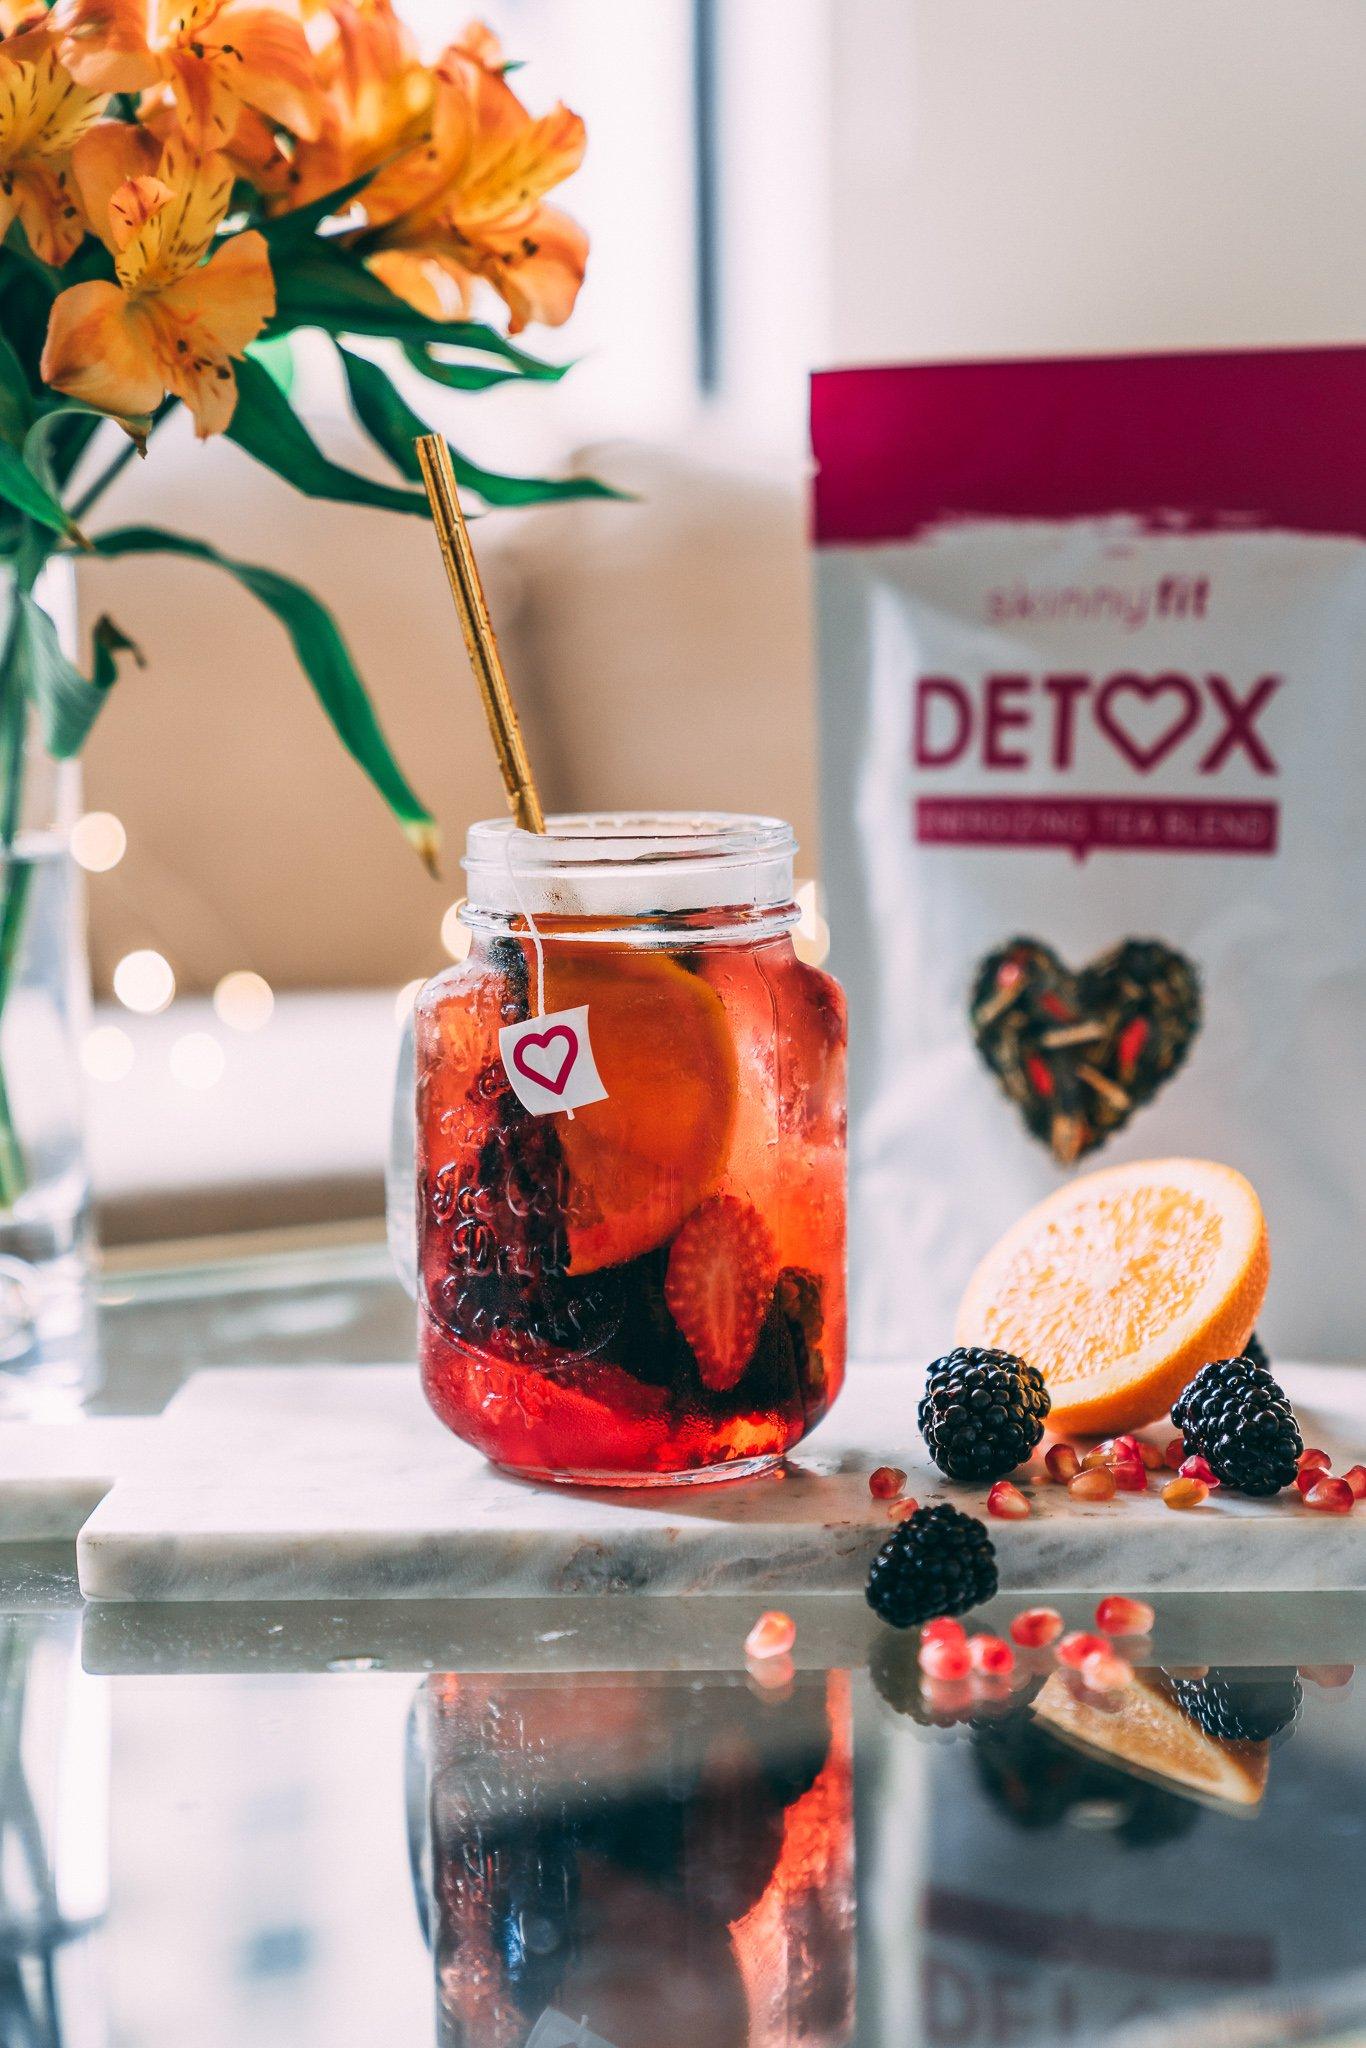 apple cider vinegar recipes - Mixed Berry Citrus Apple Cider Vinegar Detox Recipe